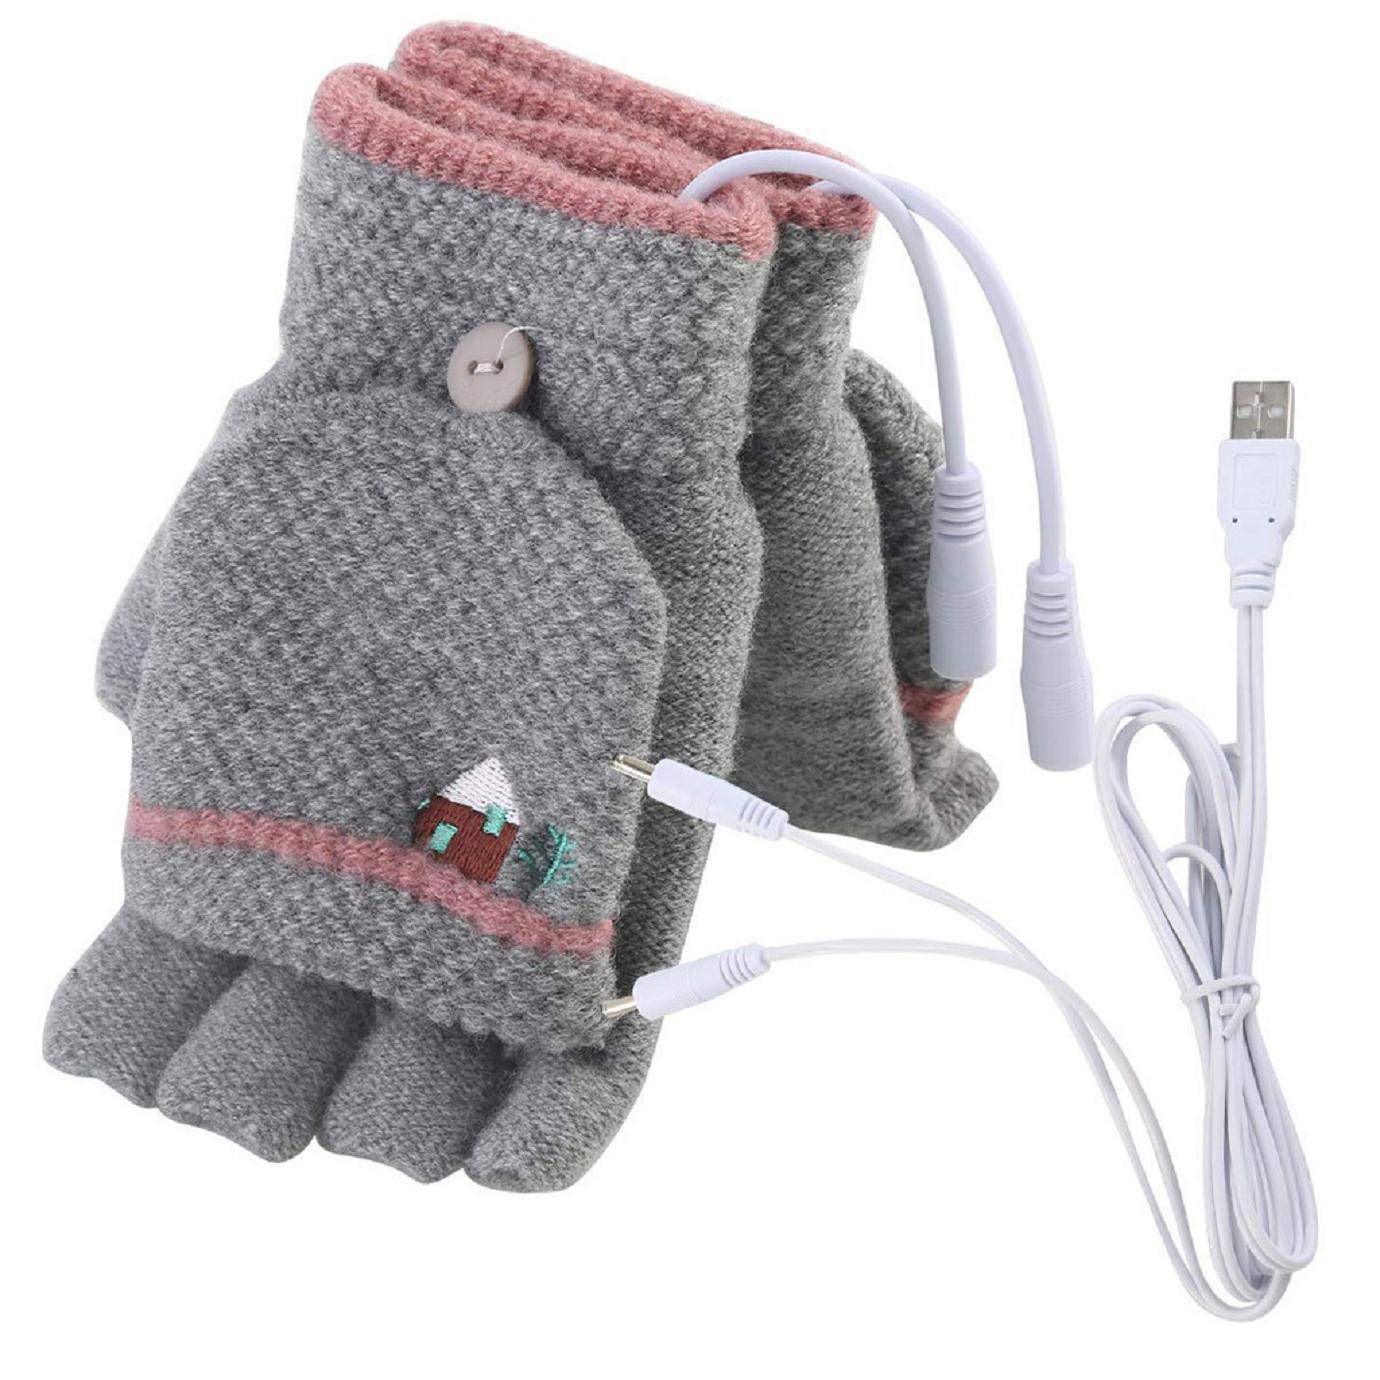 Dartphew Home 1 Pair of Heating Gloves Women Men USB Heated Mitten Full&Half Finger Winter Warm Knit Hand Gloves Comfortable Washable Design Double-Sided Heating (Temperature Range:40(±5)°C)